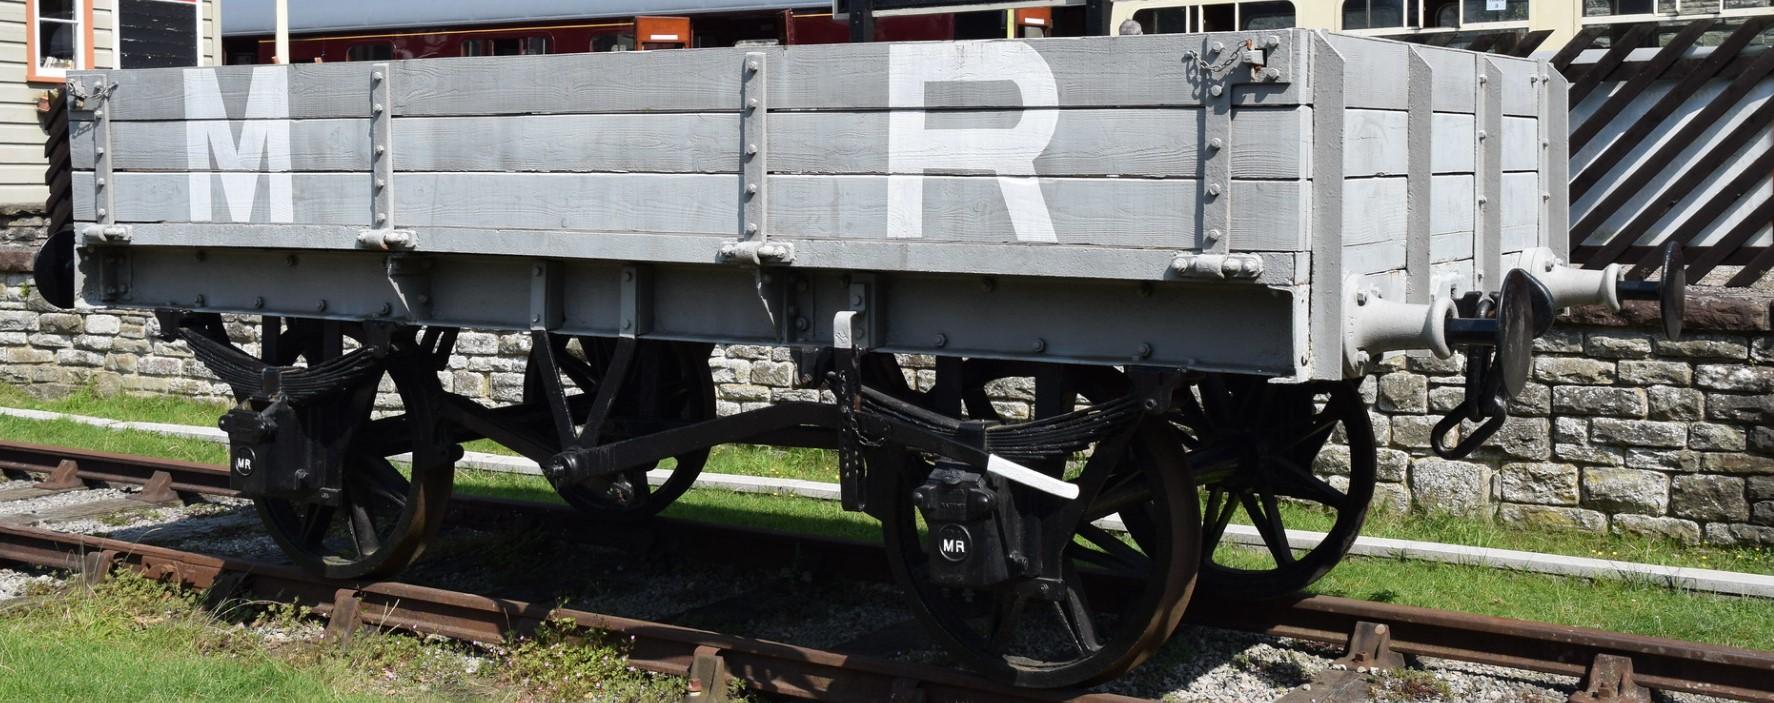 3 plank wagon at the Dean Forest Railway in August 2019. ©Hugh Llewelyn